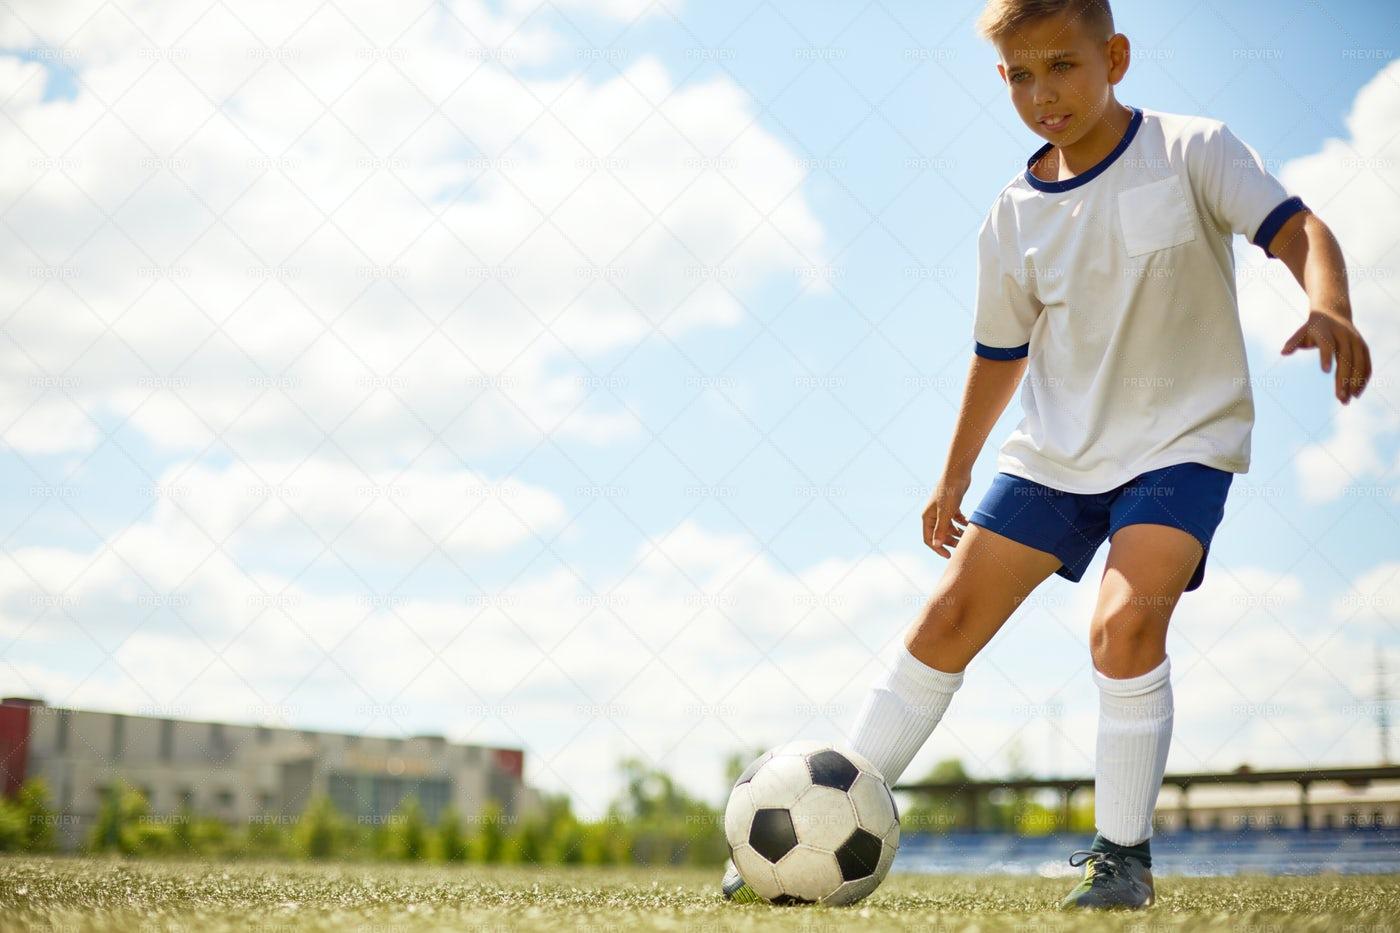 Teenage Boy Playing Football: Stock Photos